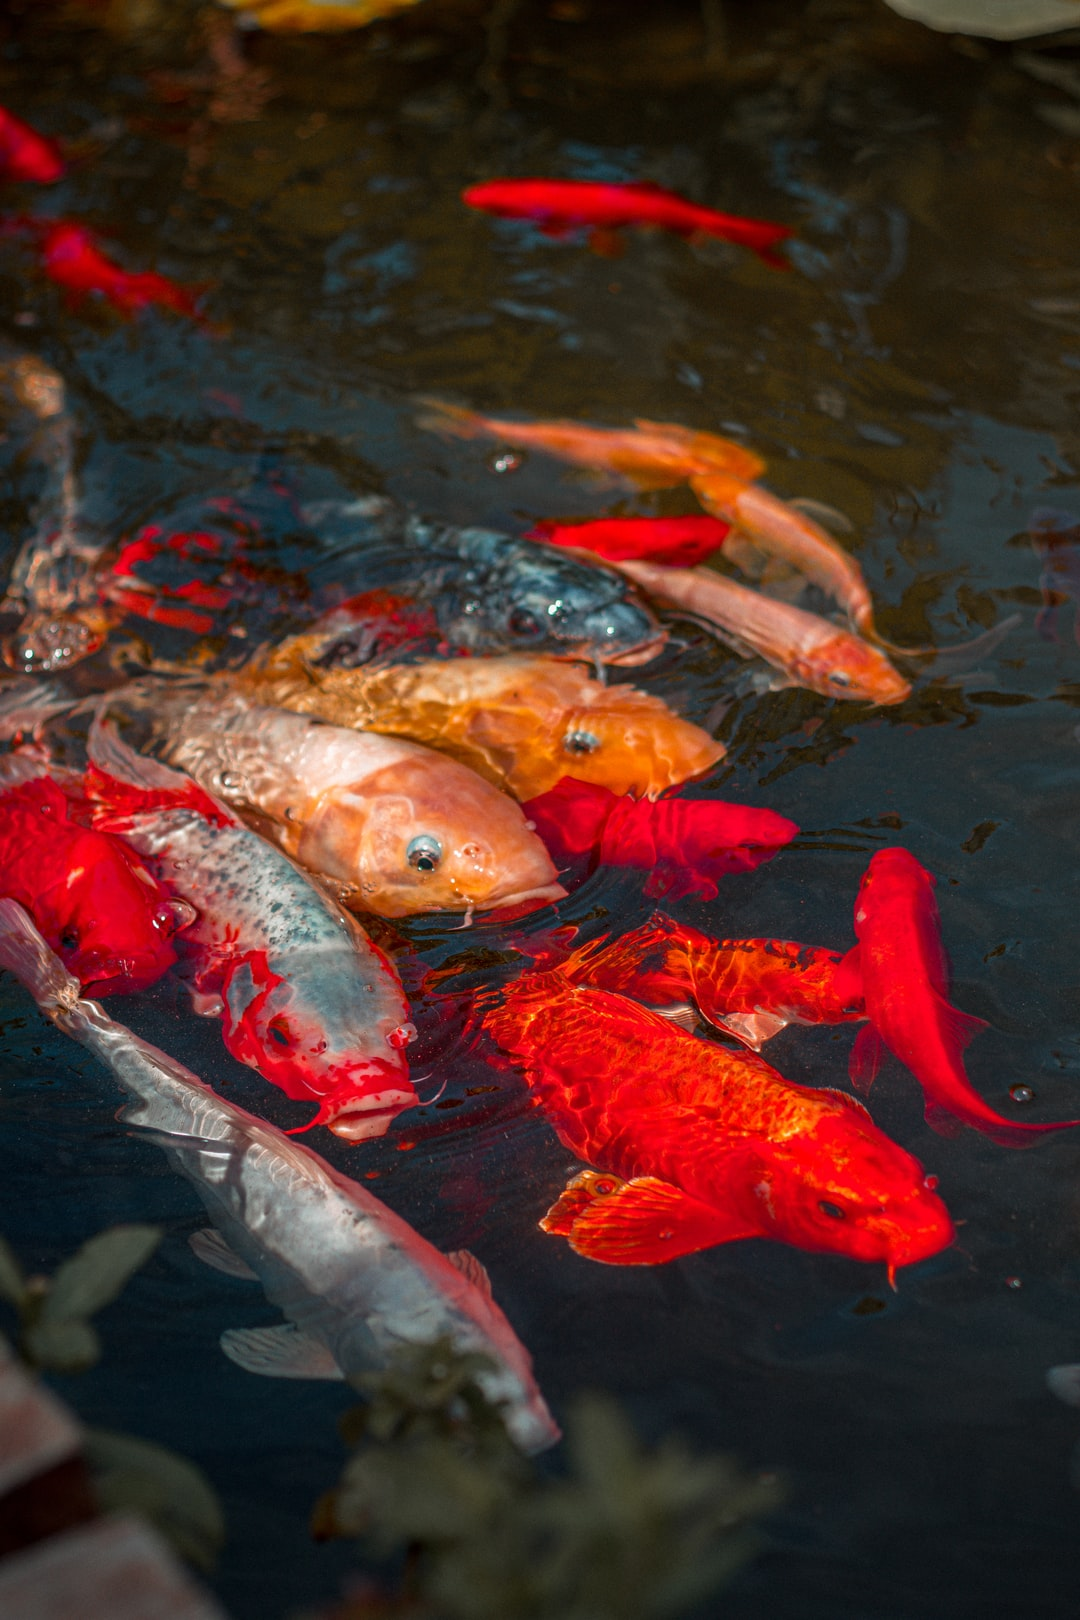 Merawat Ikan Di Dalam Akuarium Dengan Benar